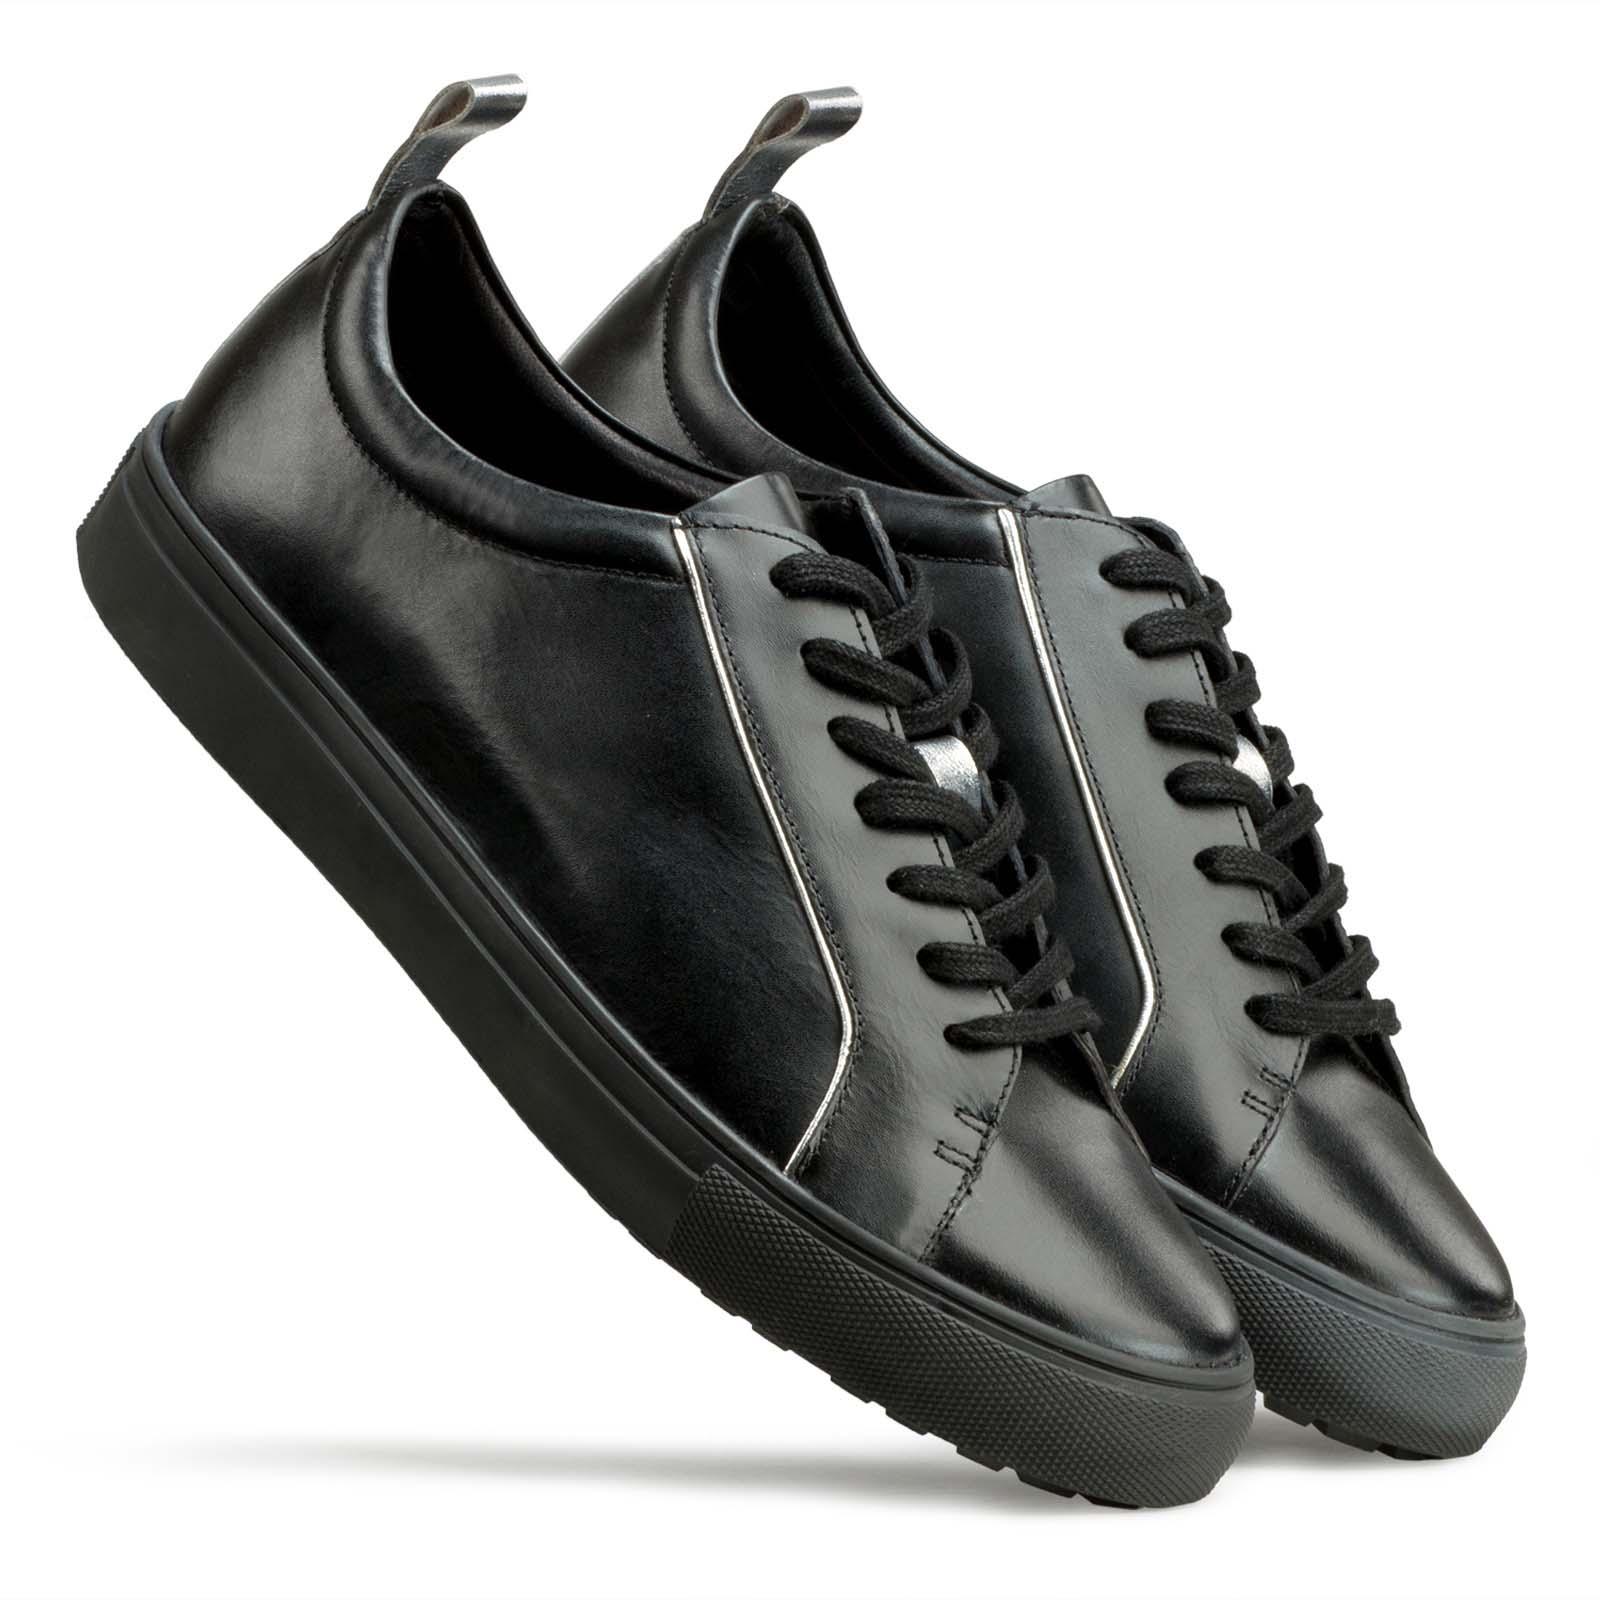 Men's Black Low-Top Leather Sneakers